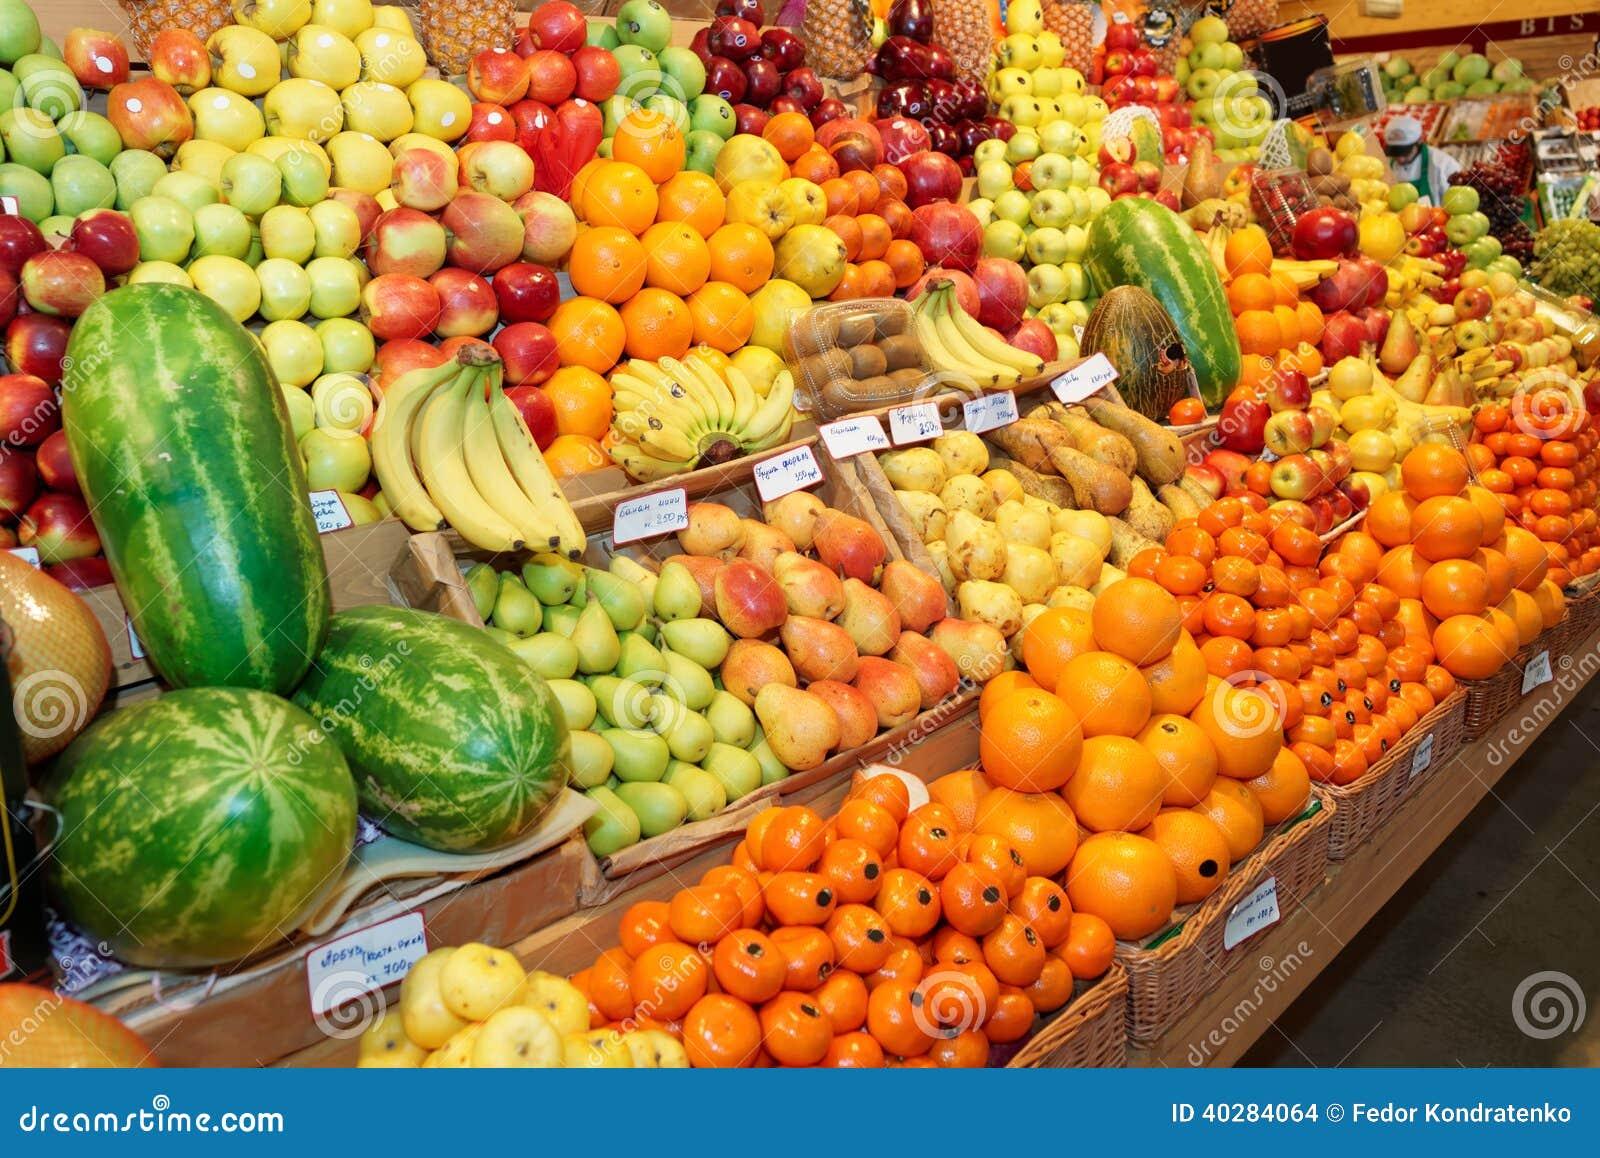 Плодоовощи на рынке фермы